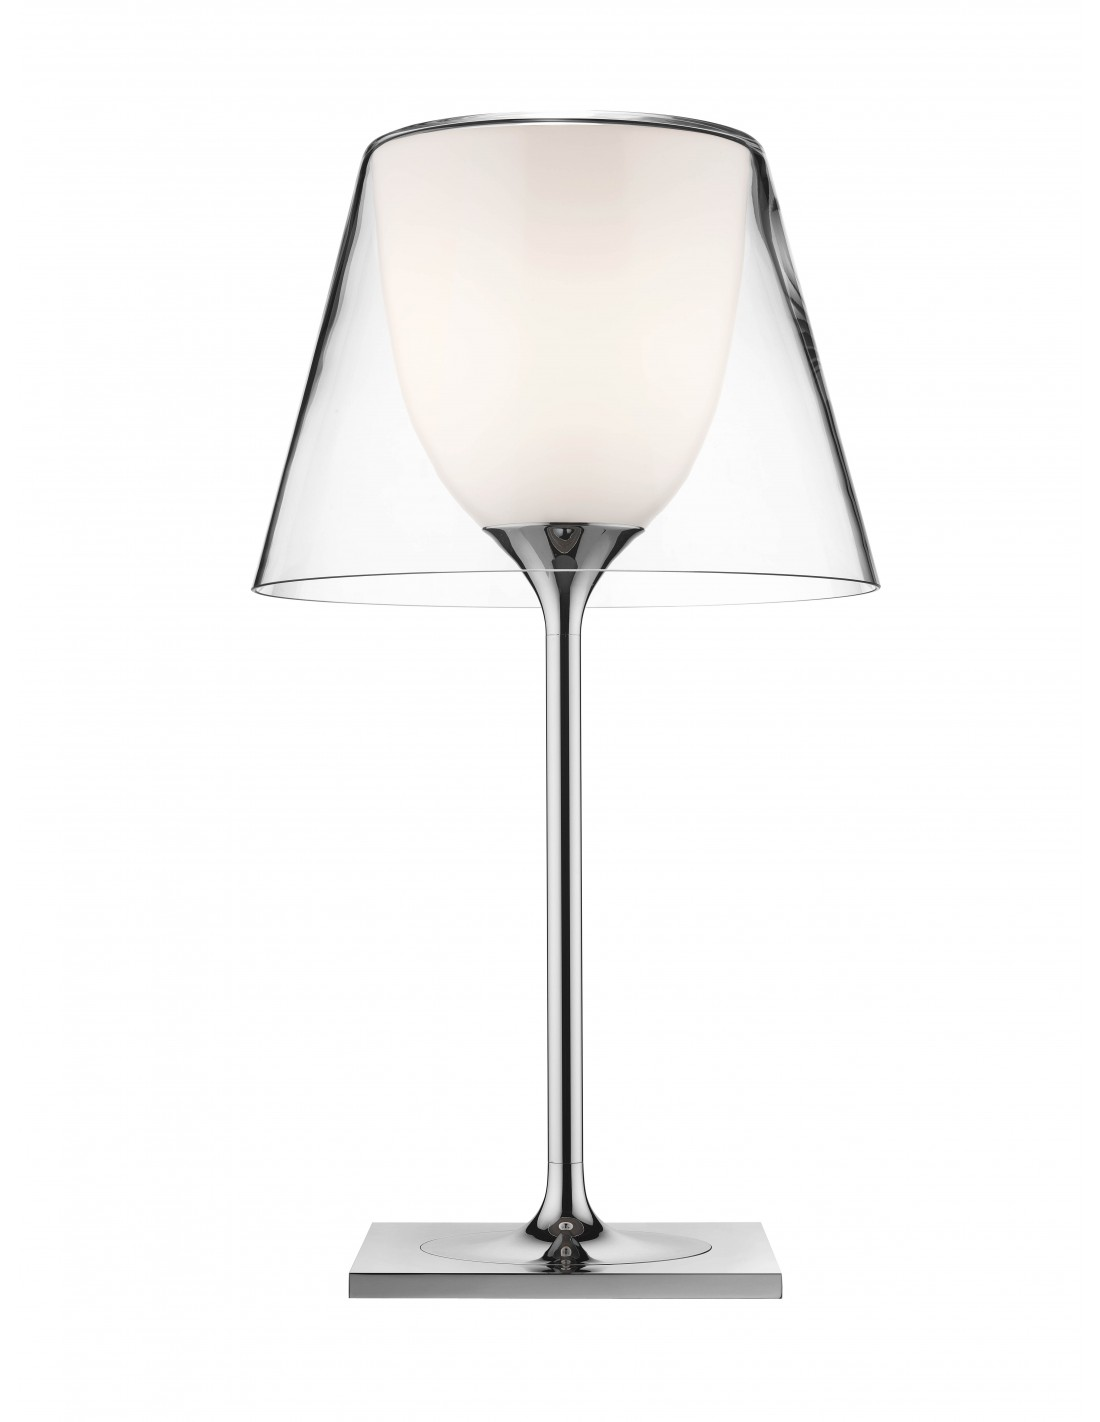 Lampe de table Ktribe T1 Glass - designer Philippe Starck - marque FLOS - revendeur Valente Design